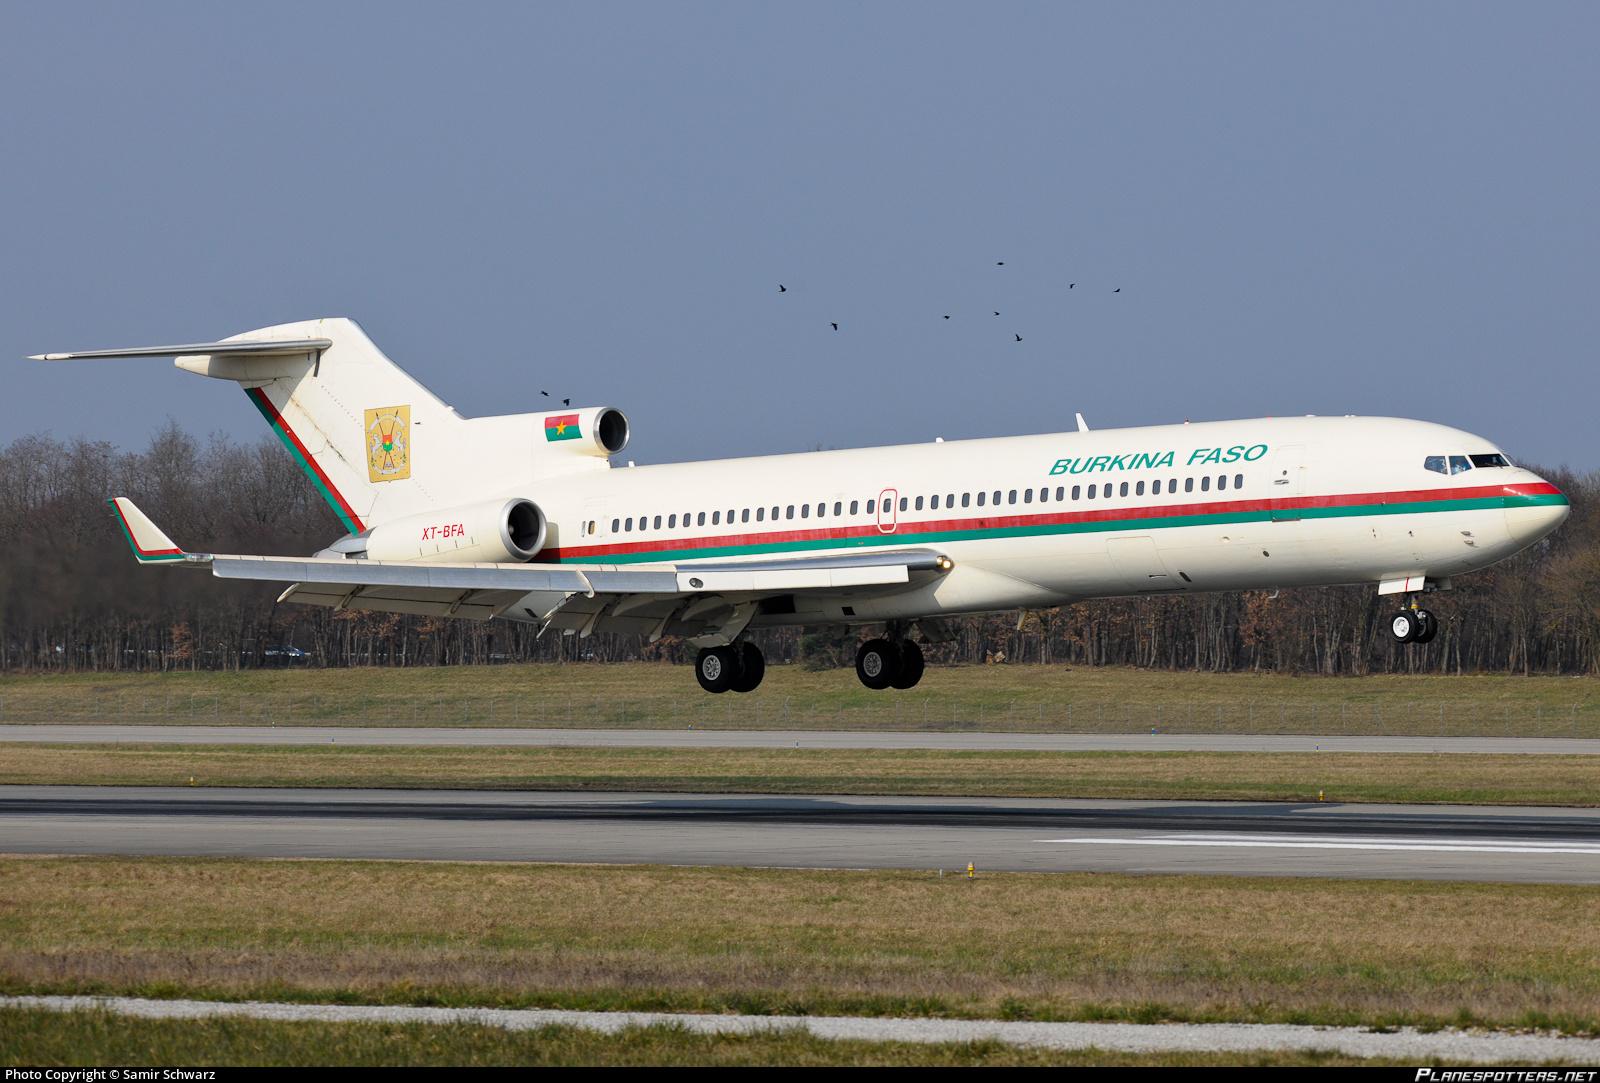 xt-bfa-government-of-burkina-faso-boeing-727-282arewl_PlanespottersNet_374035.jpg